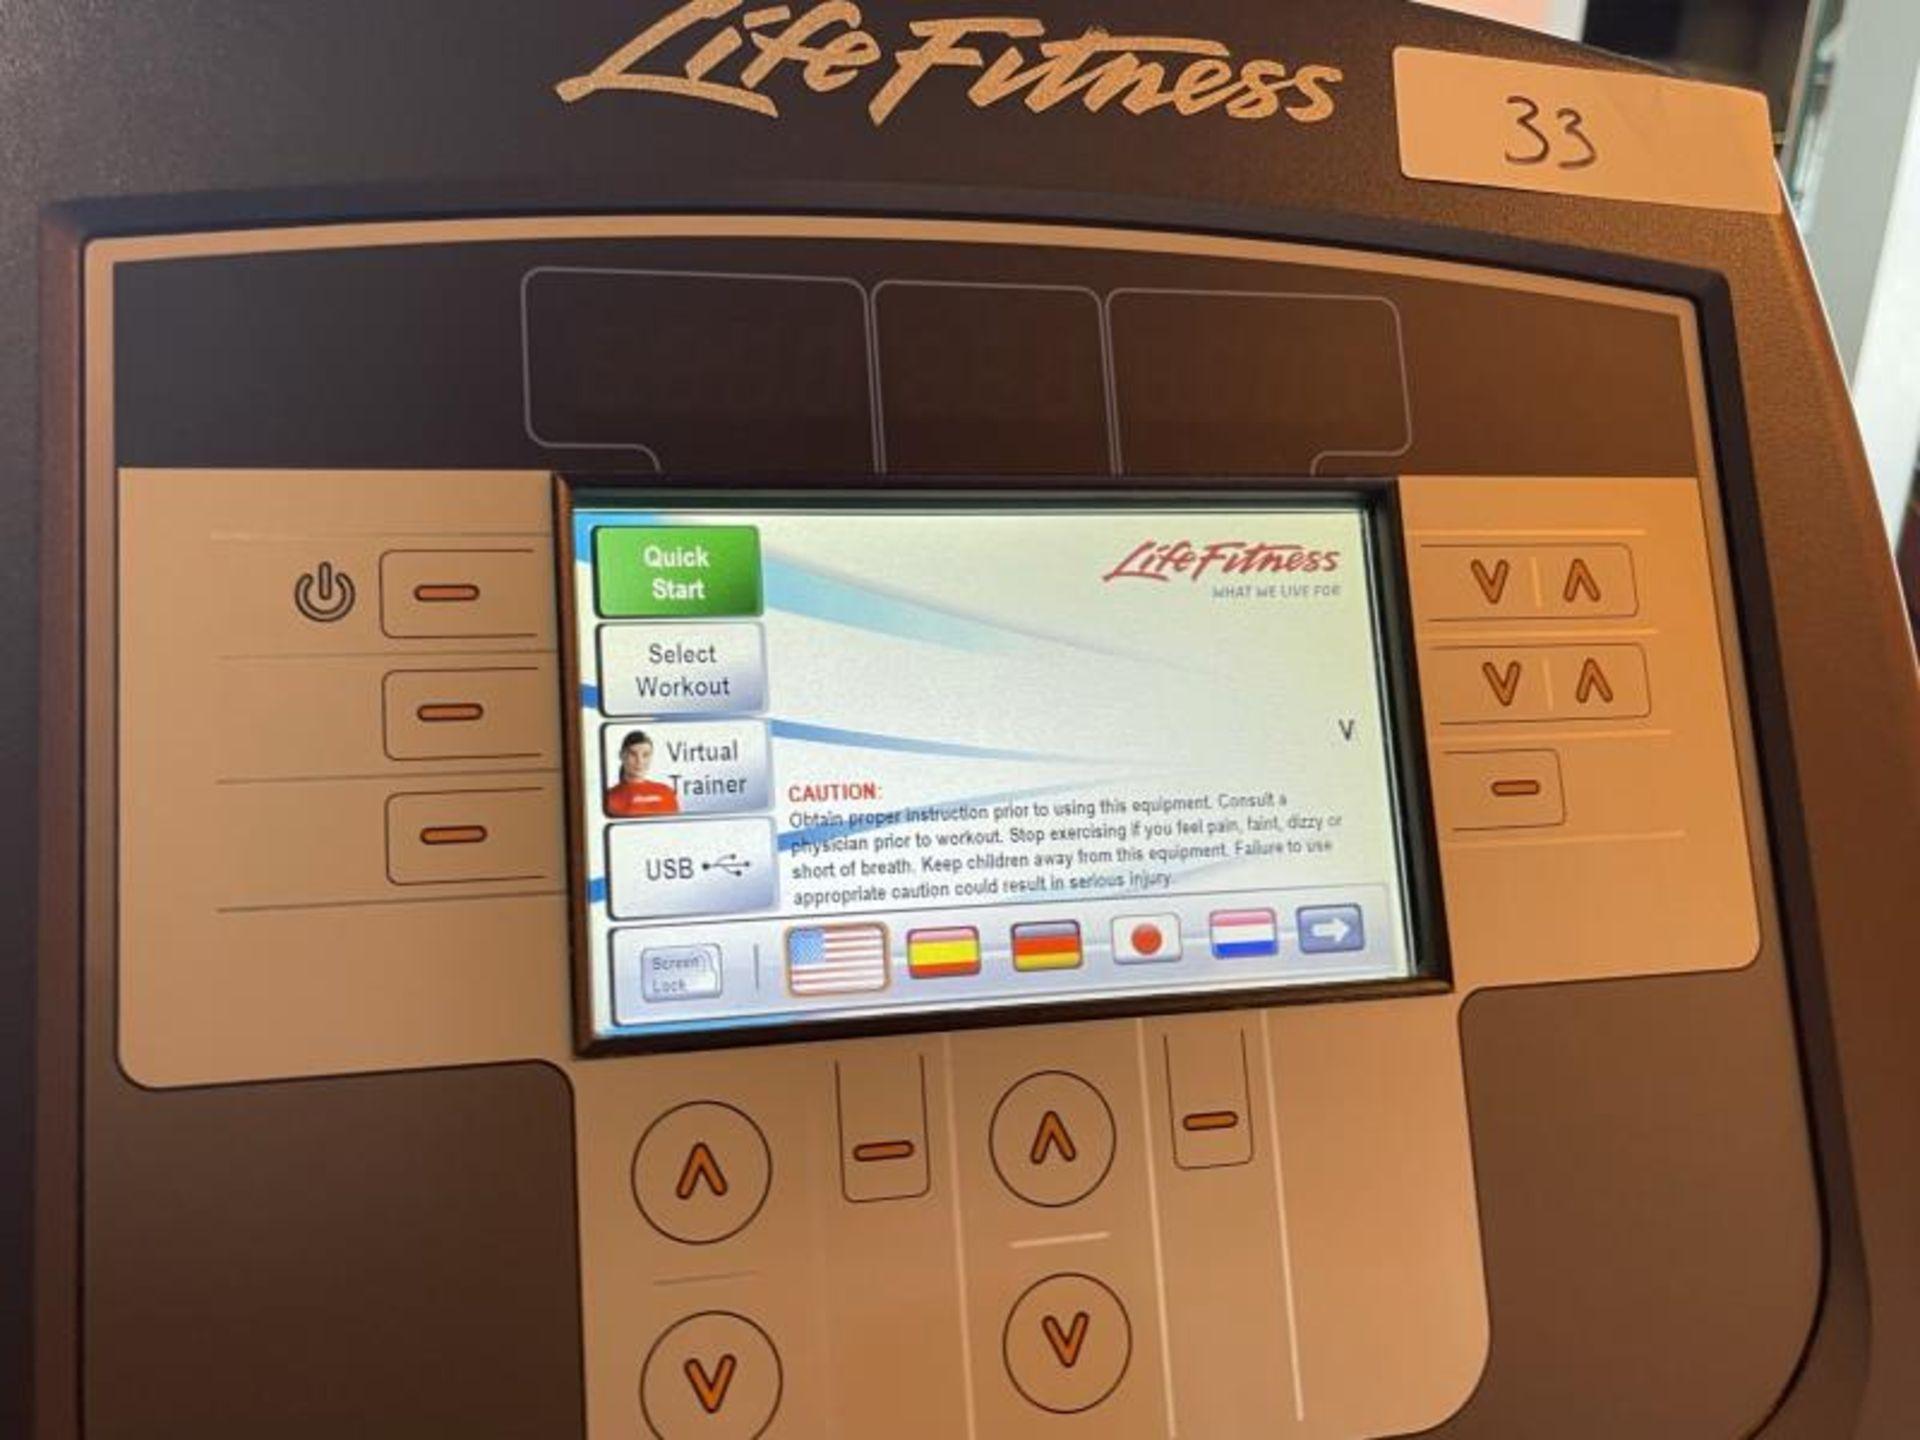 Life Fitness Elliptical M: 95X - Image 5 of 6